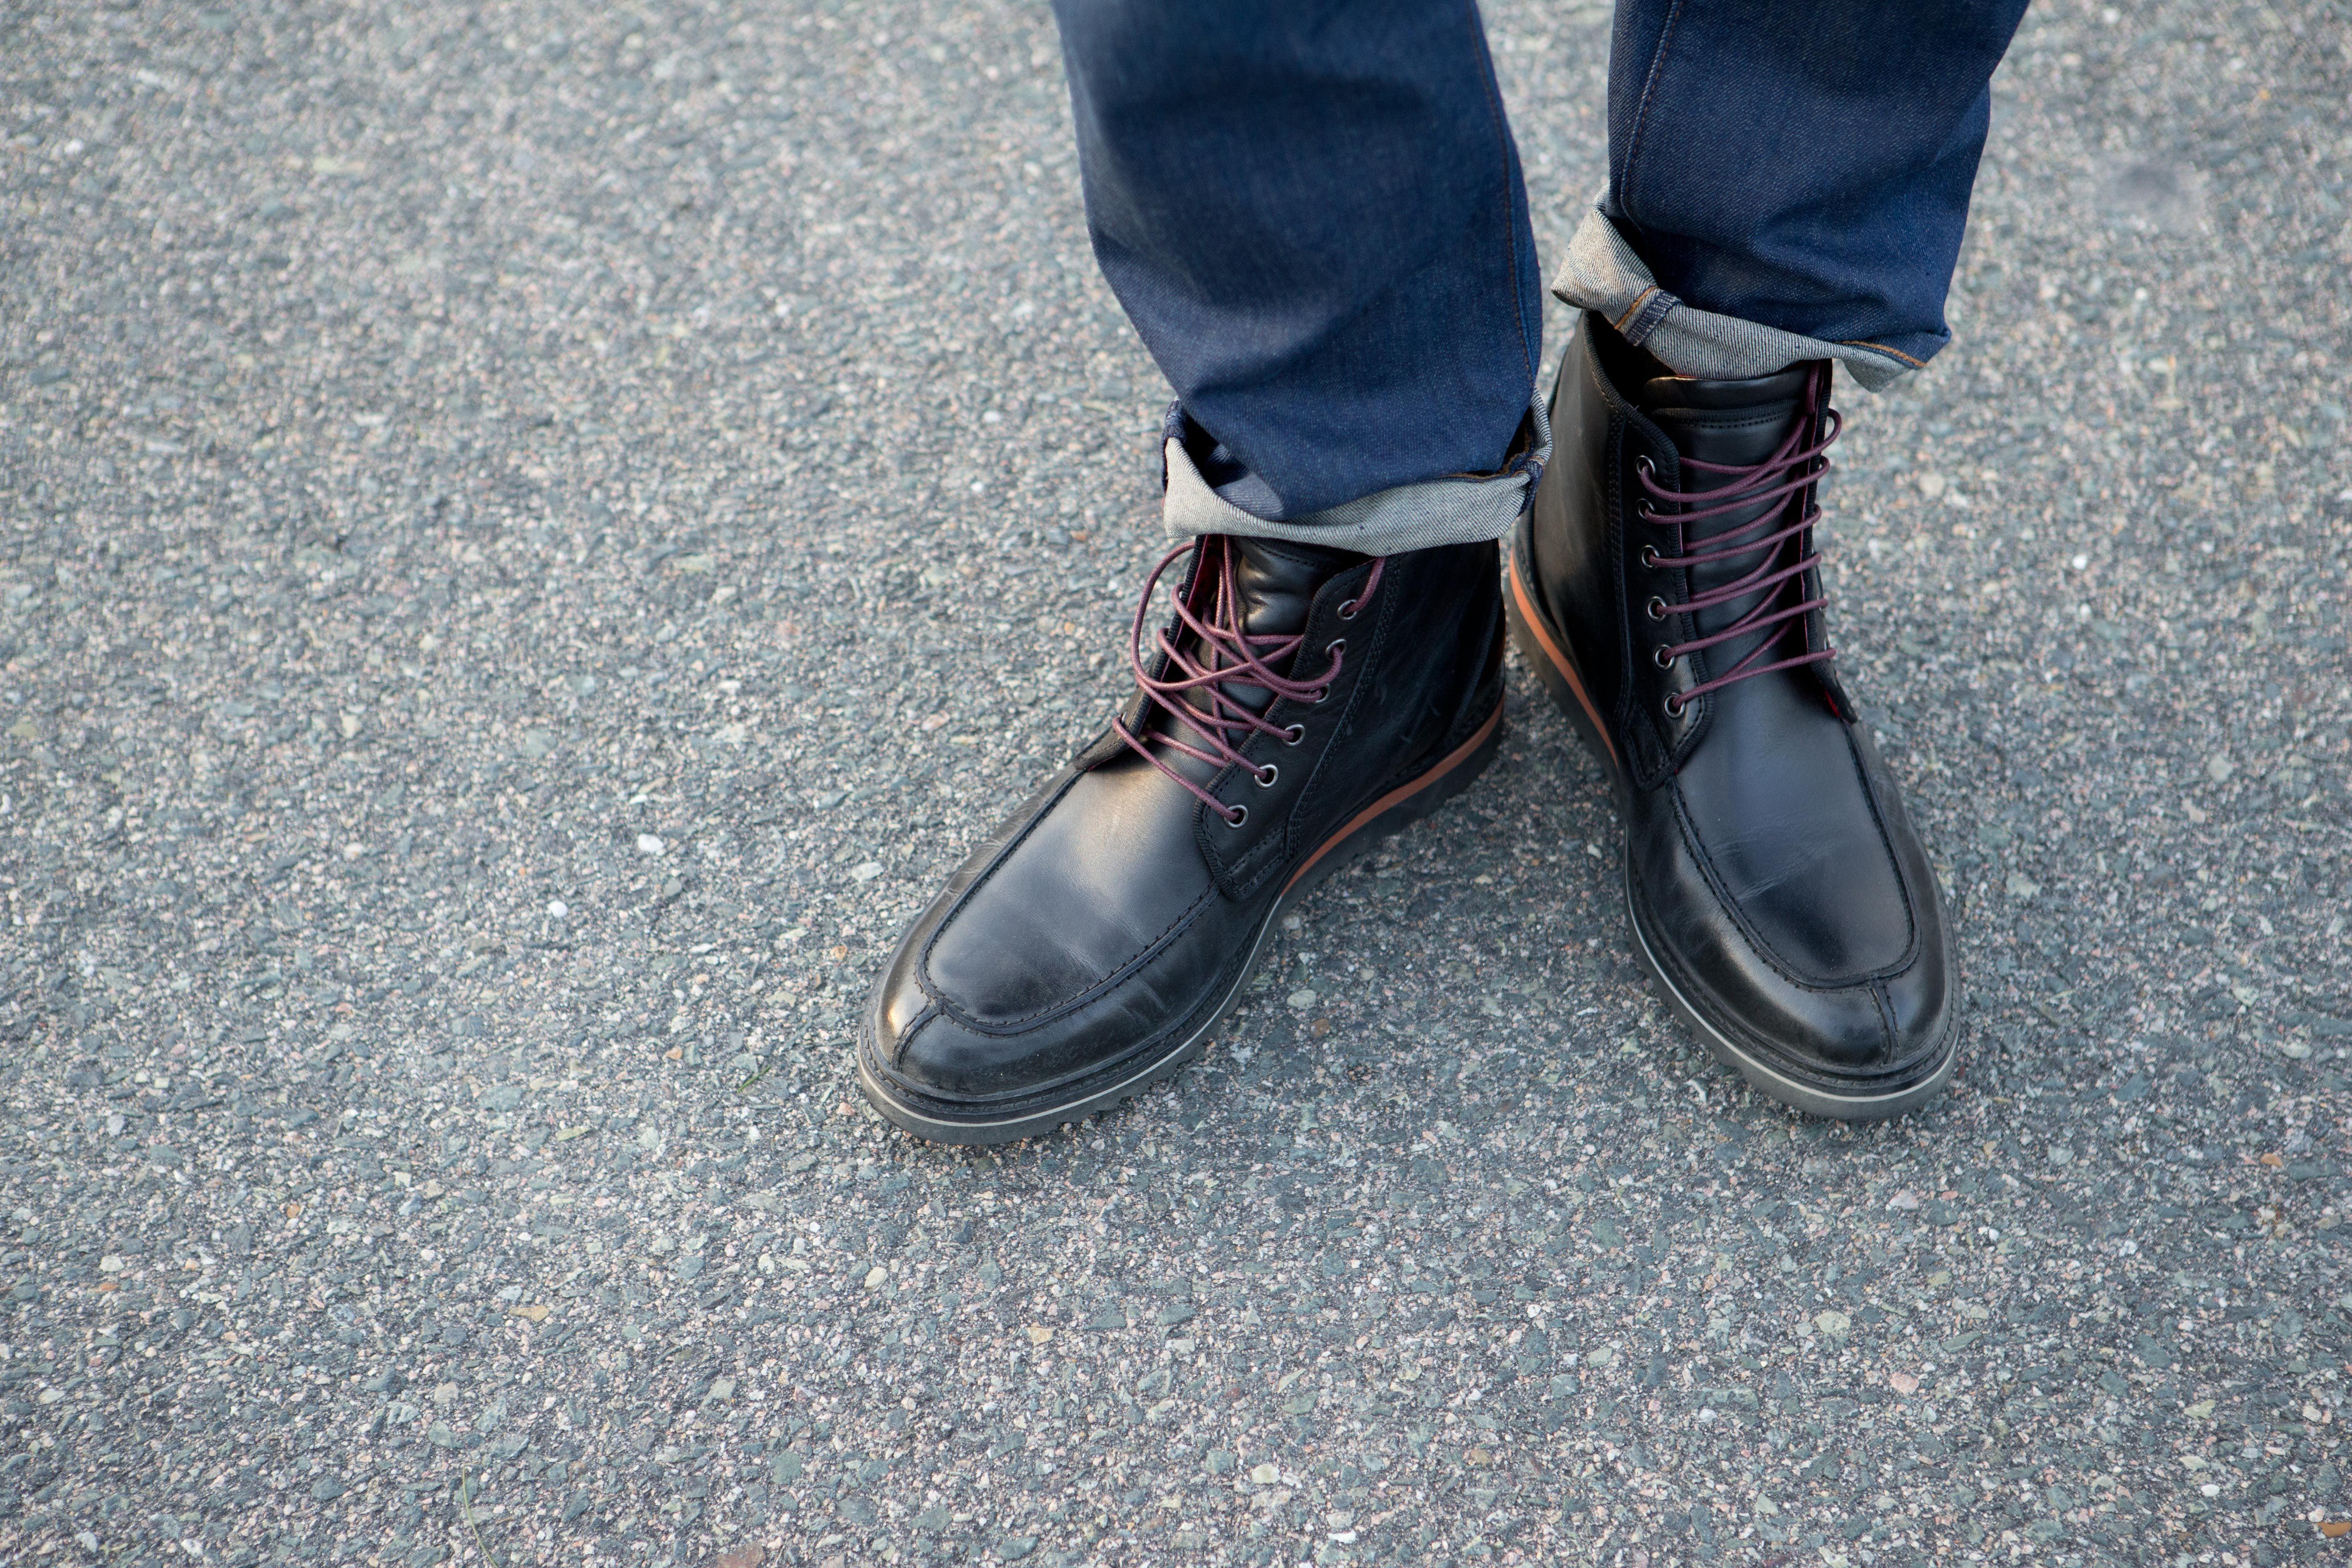 Shine those shoes